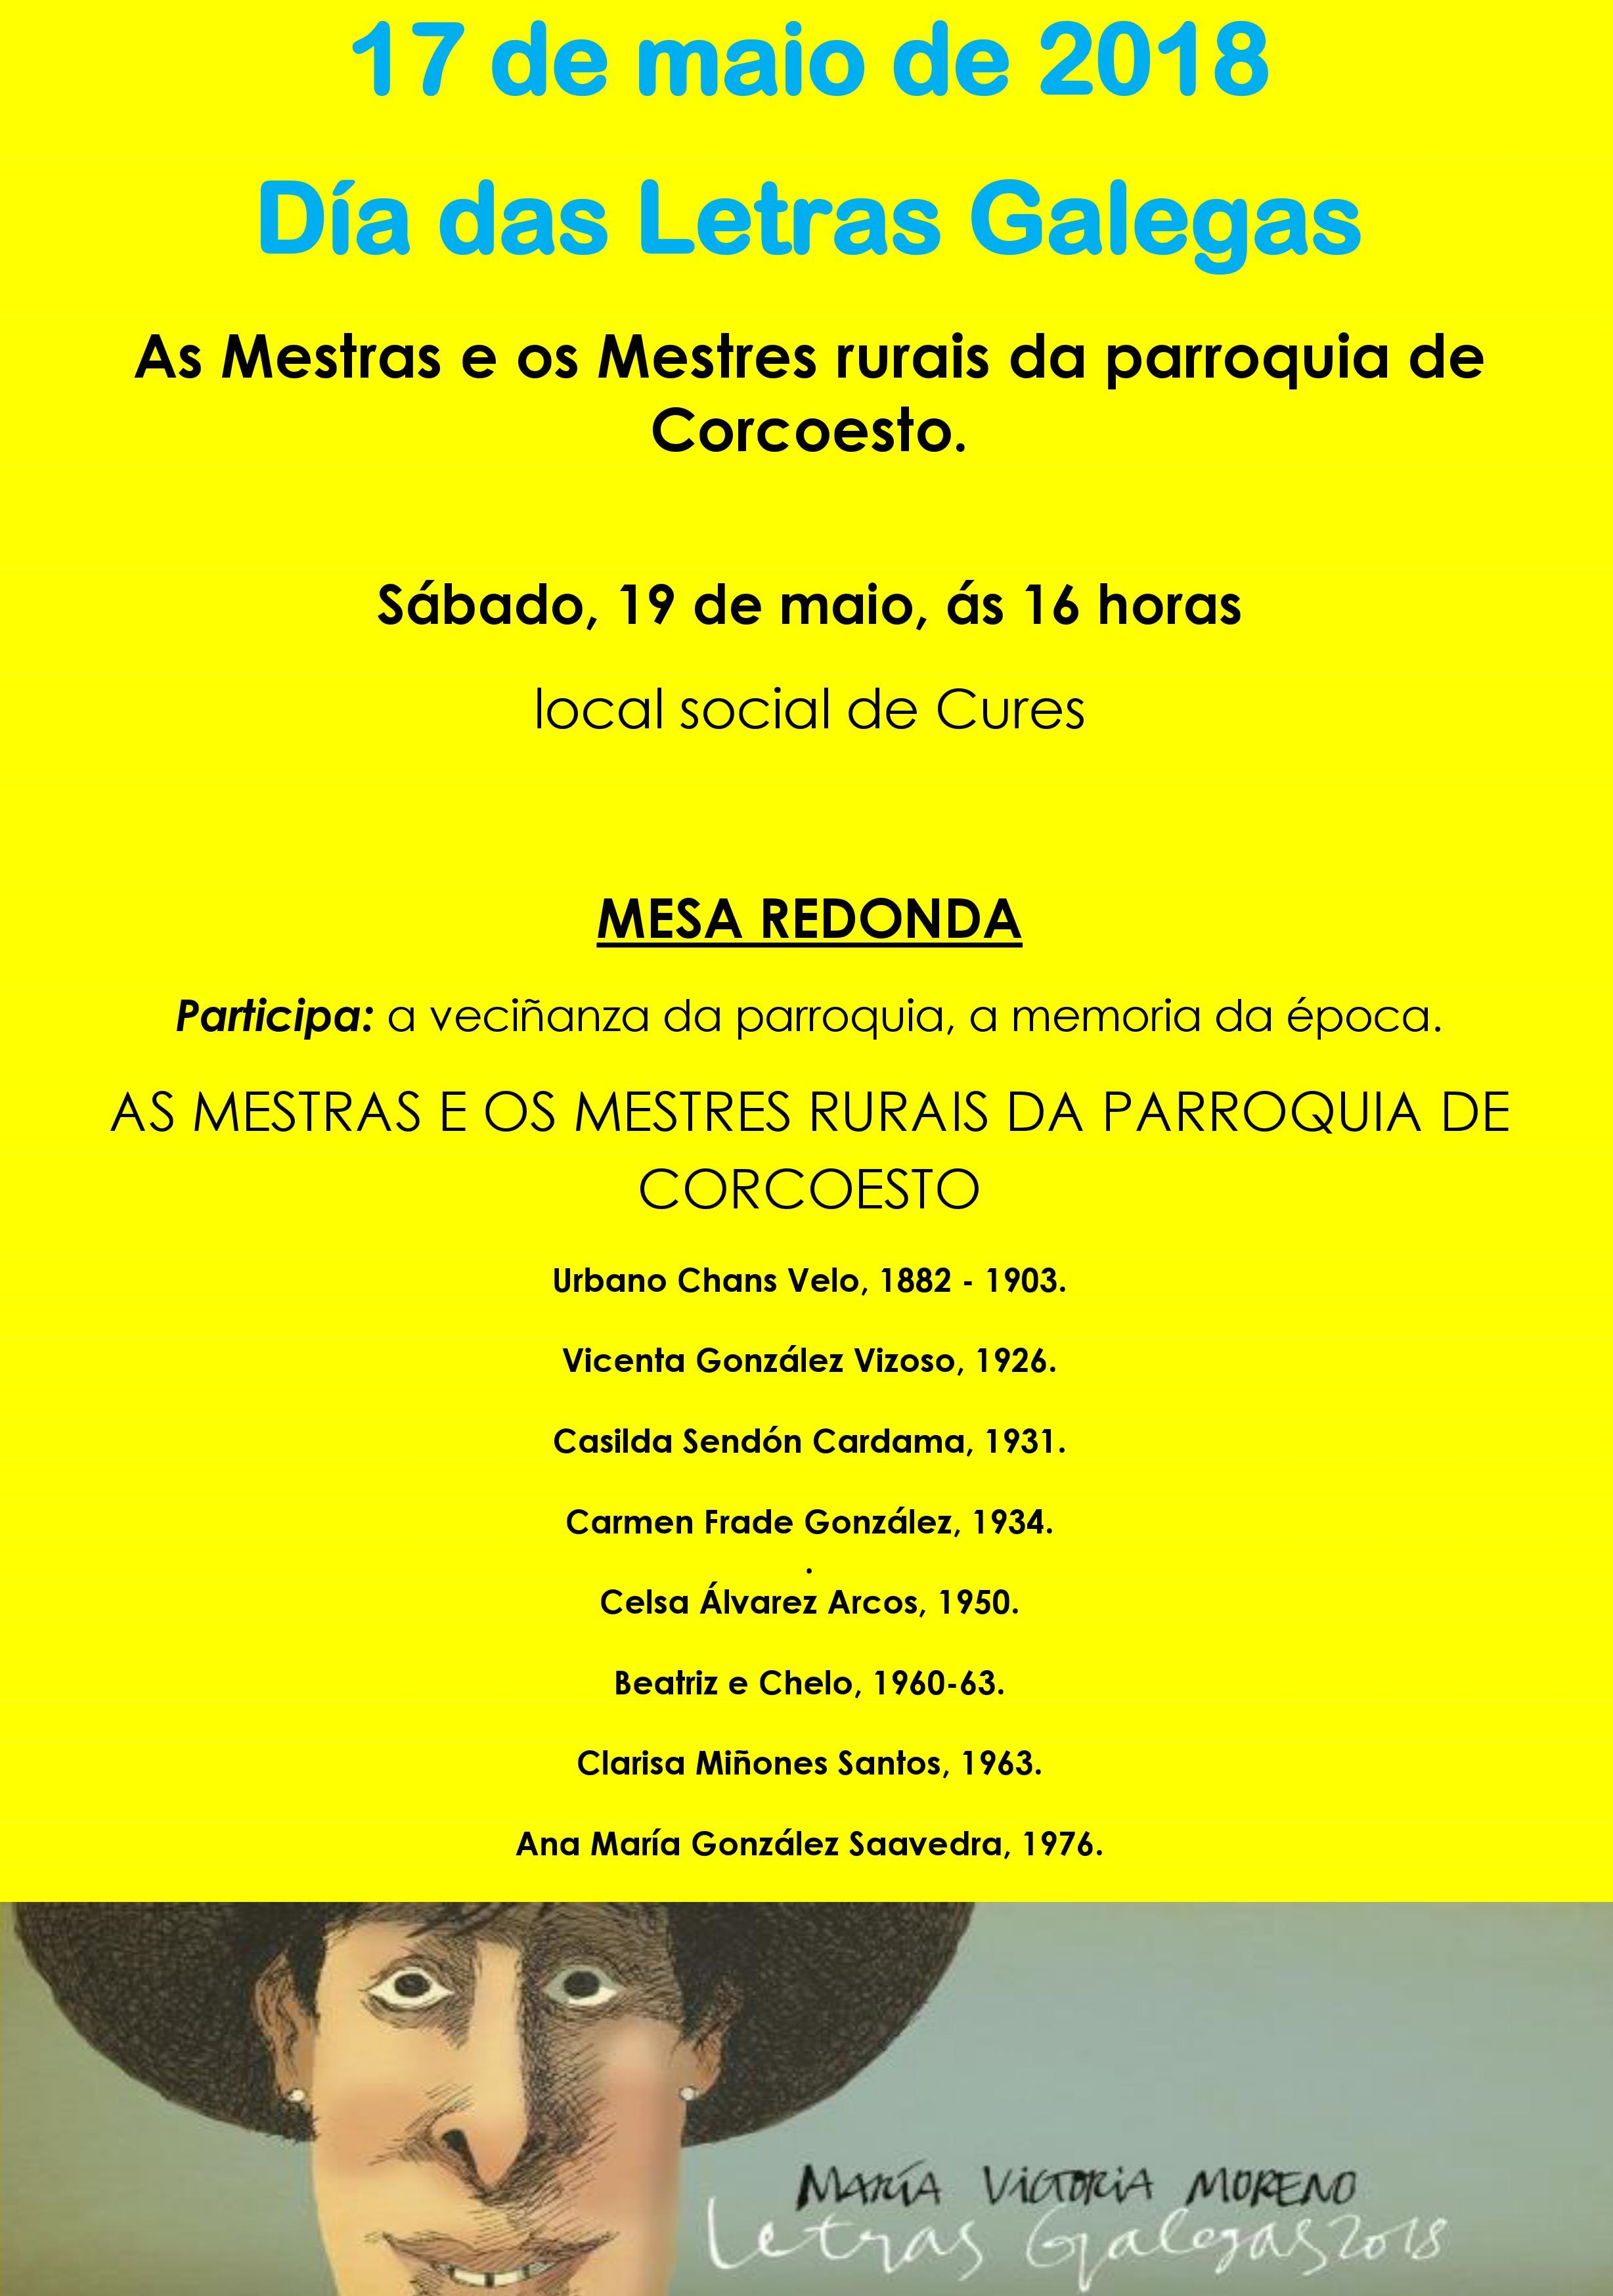 LETRAS GALEGAS CORCOESTO